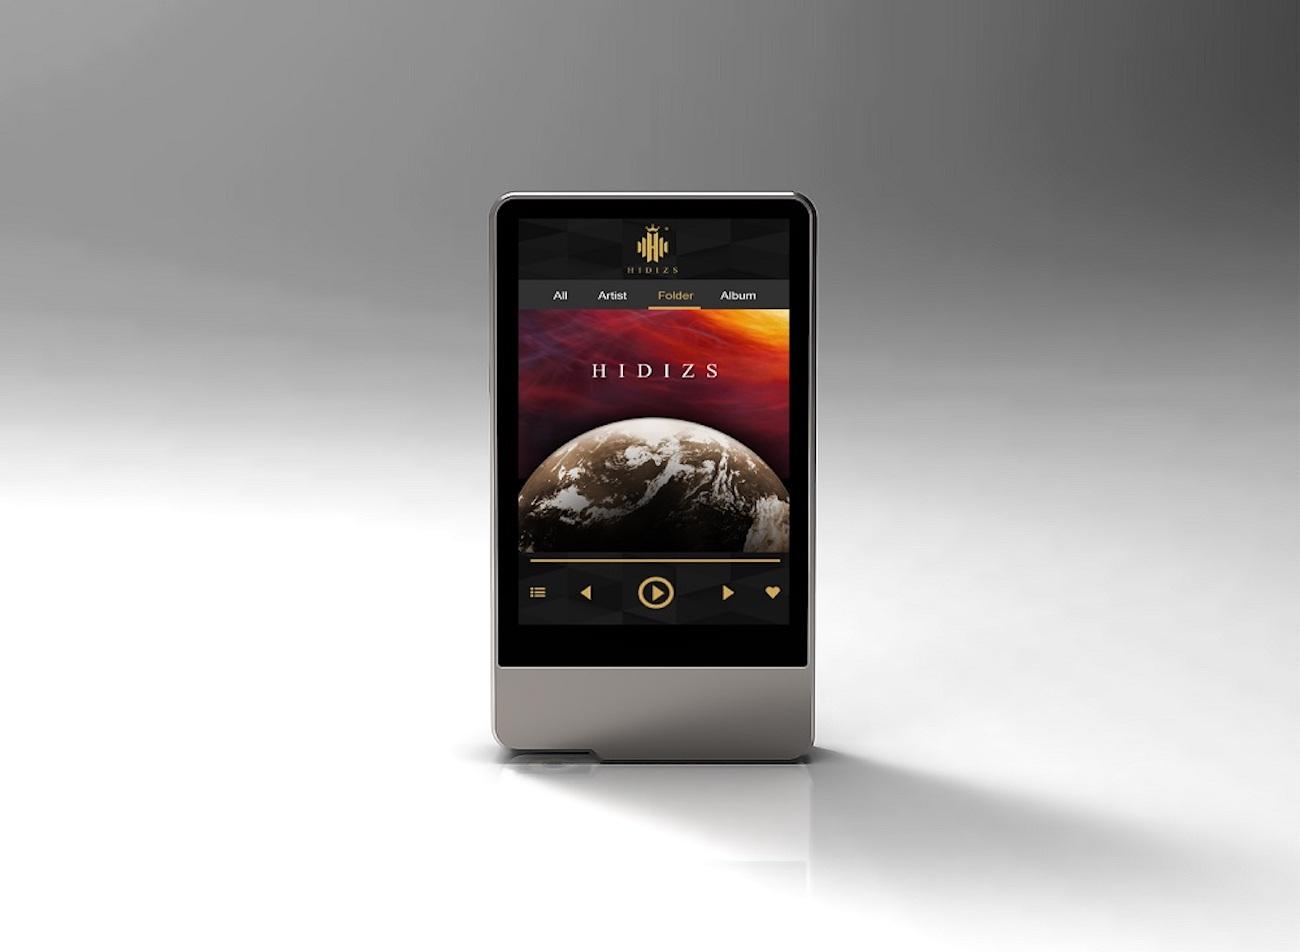 Hidizs AP200 Smart HiFi Music Player